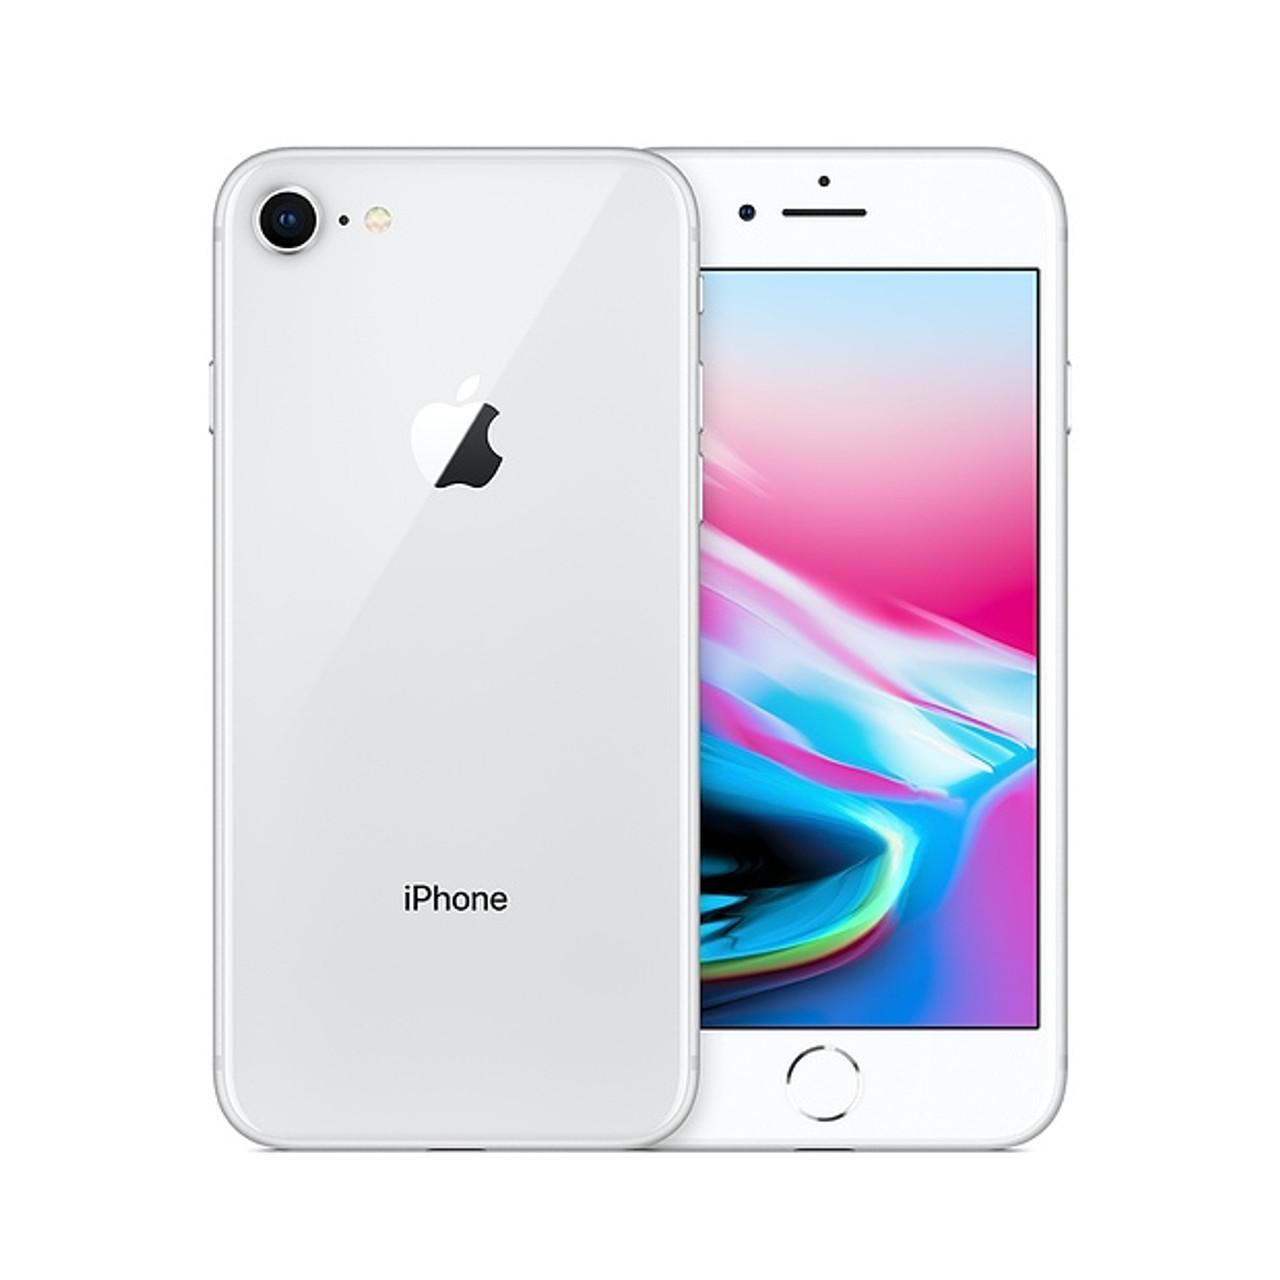 Apple iPhone 8 (Unlocked) 256GB - Silver MQ7R2LL/A | mac of all trades